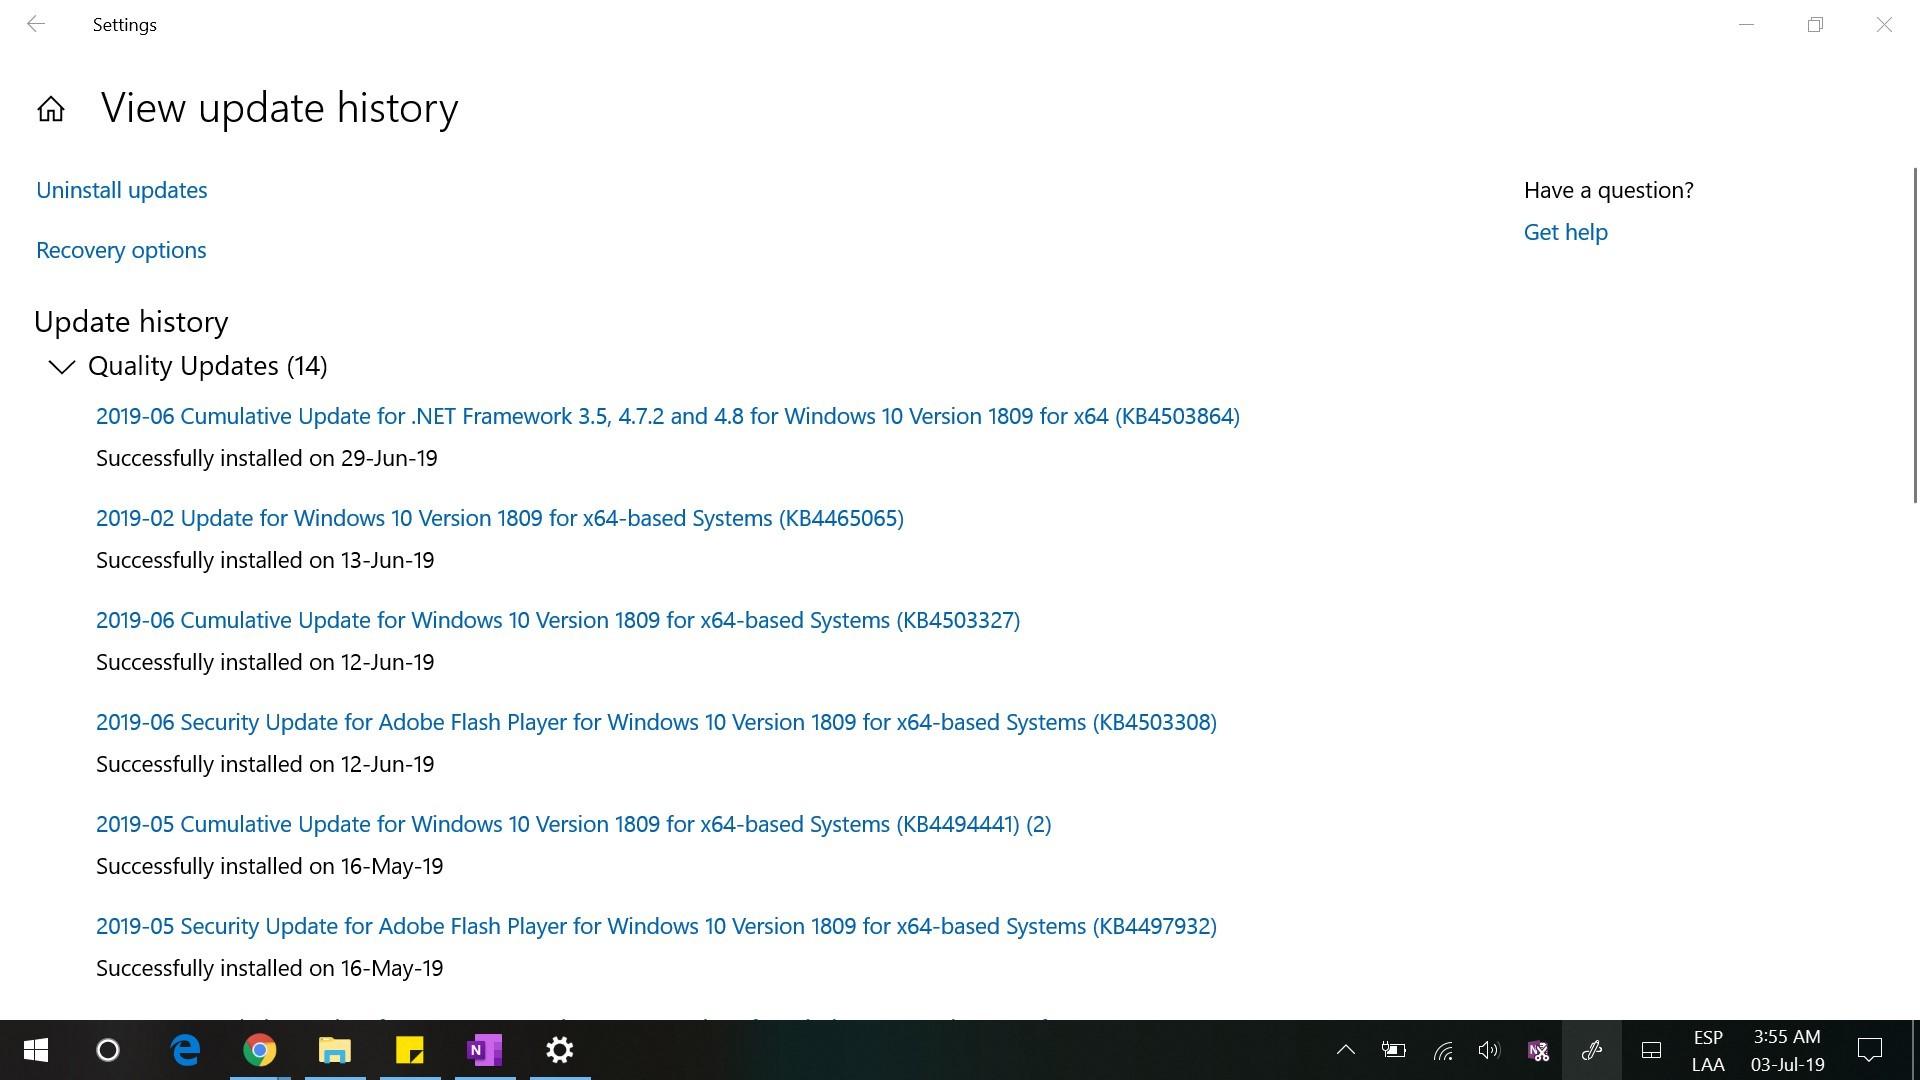 Los gestos de touchpad dejaron de funcionar c9f1529d-a0ff-407c-844c-605a867caf26?upload=true.jpg